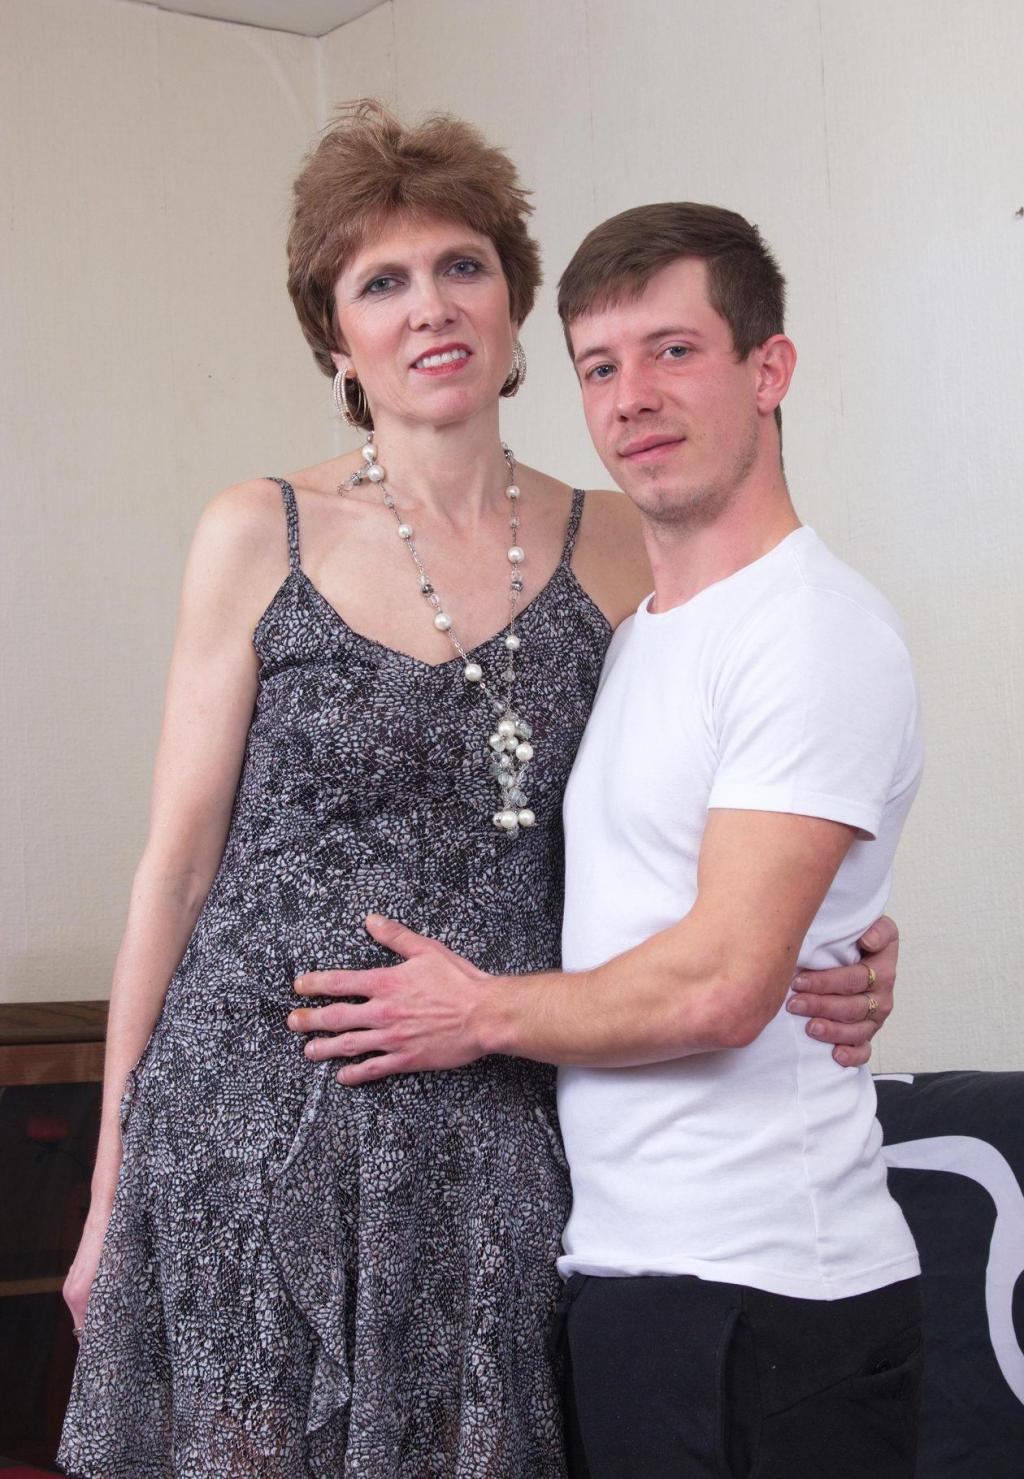 Reife Frau sucht Mann Gemeinsamere